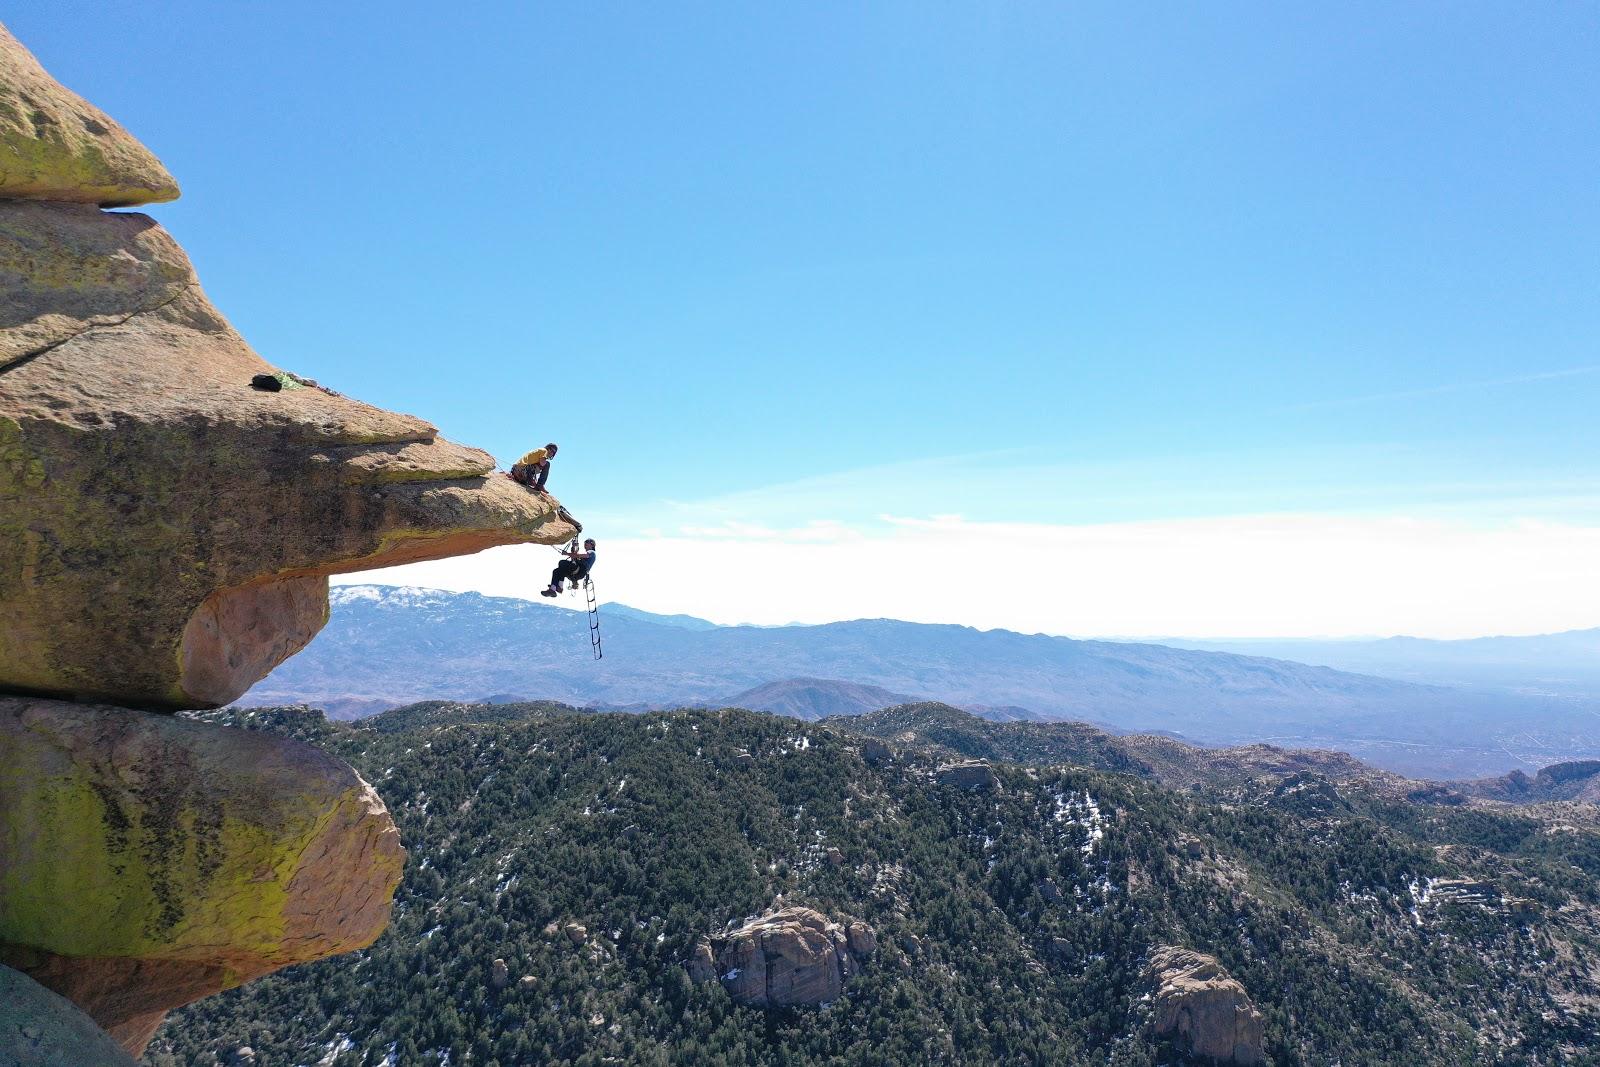 Windy Point on Mt Lemmon - Hoodoo formations